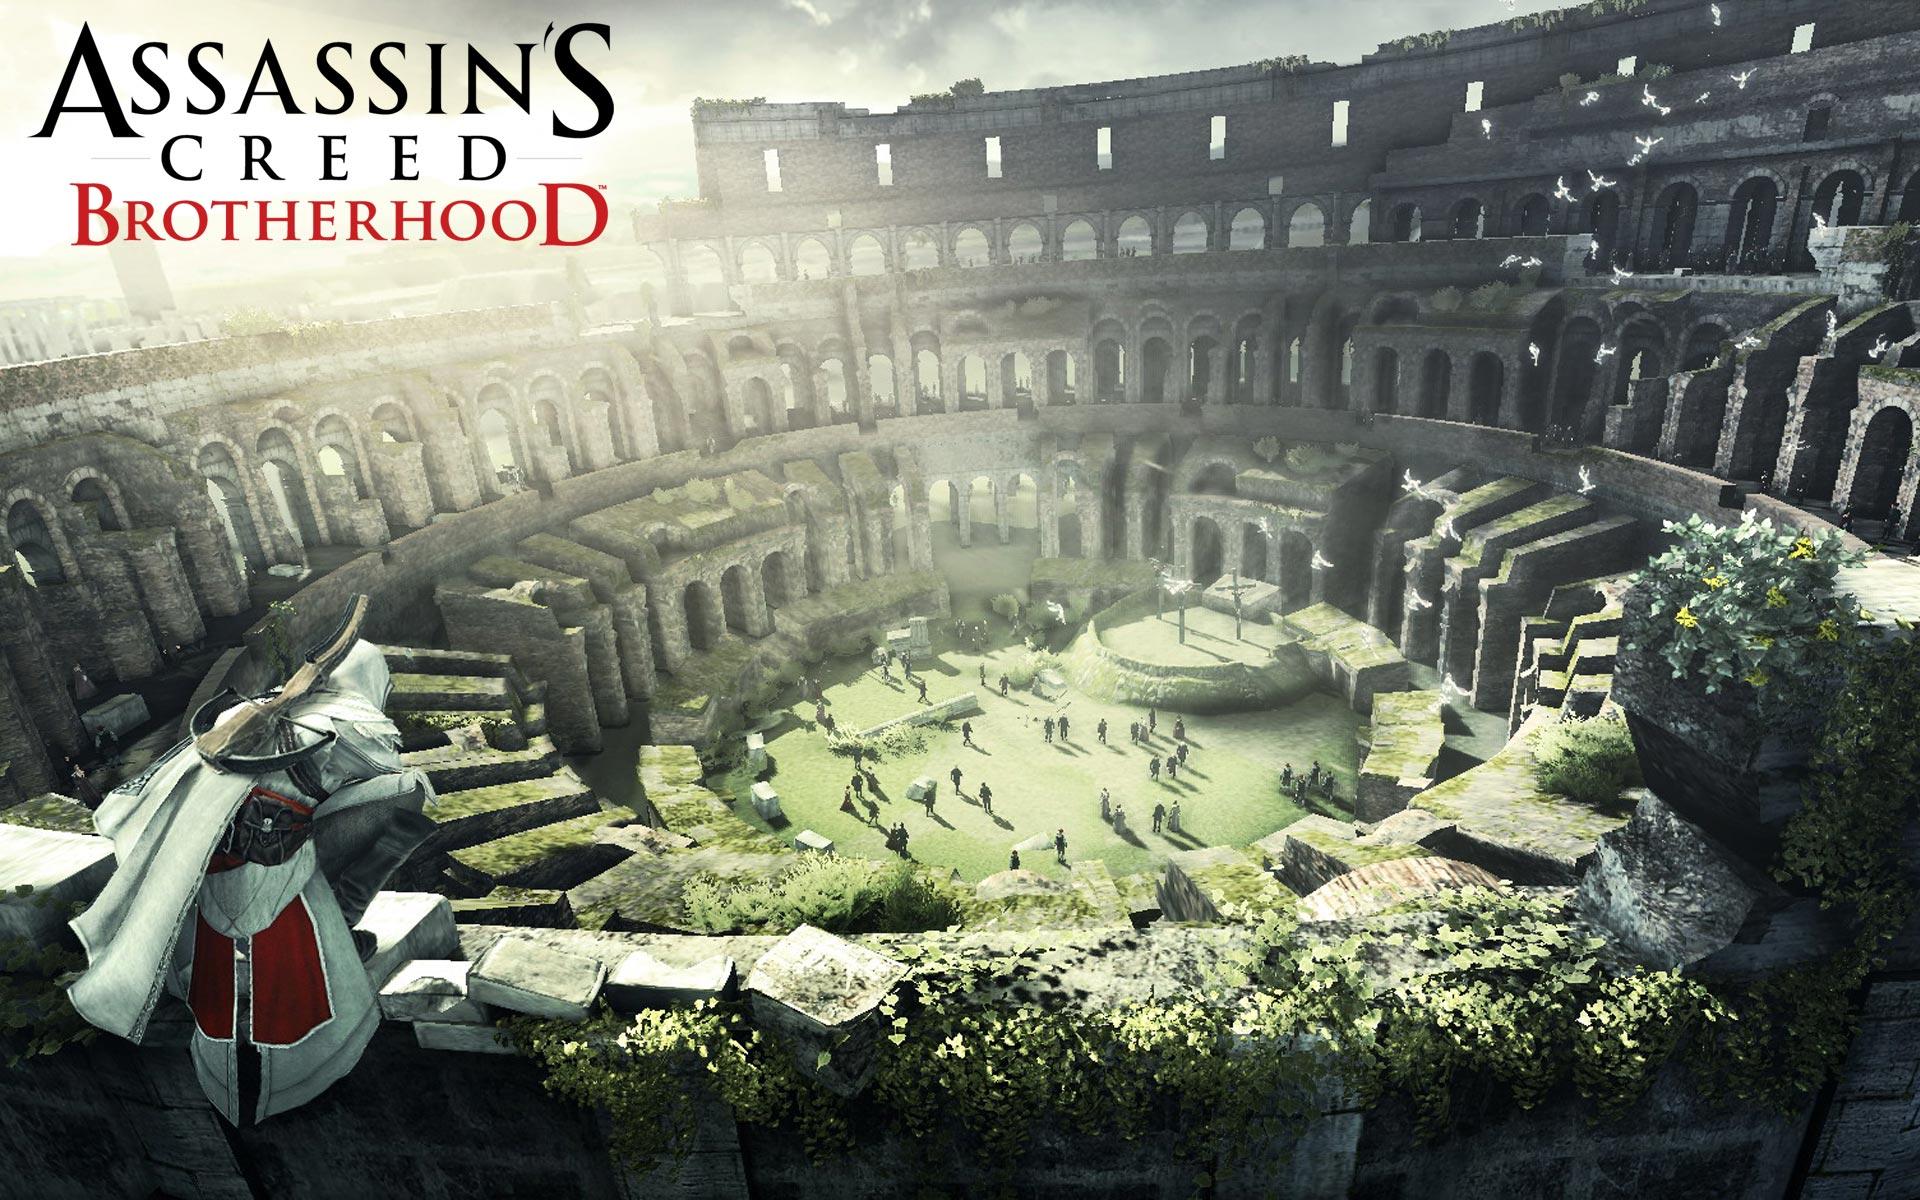 Assassins Creed Brotherhood Wallpaper: Assassin's Creed: Brotherhood